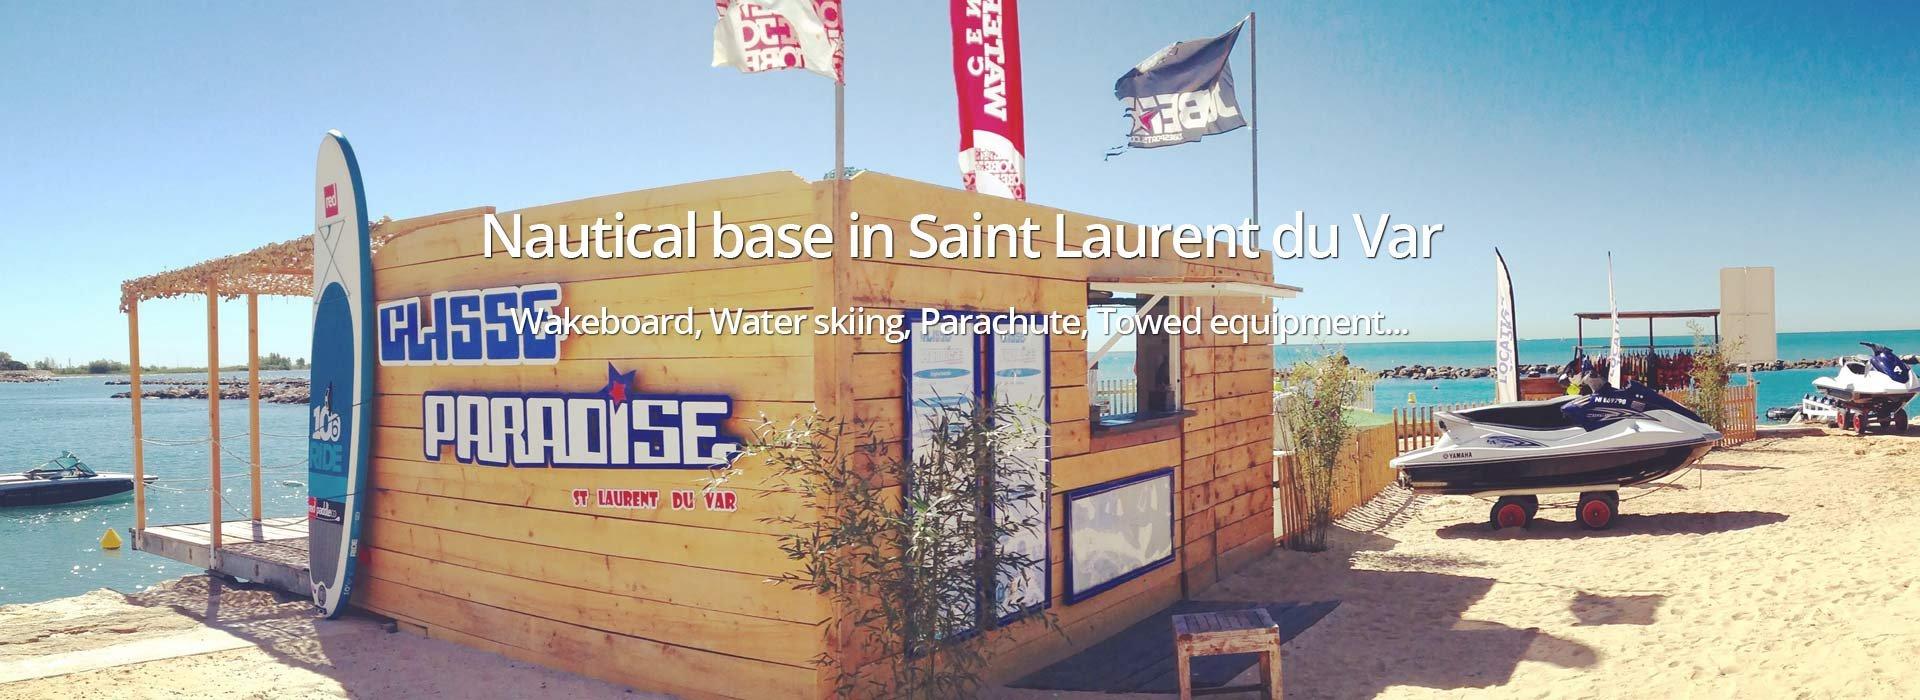 Nautical base in Saint Laurent du Var